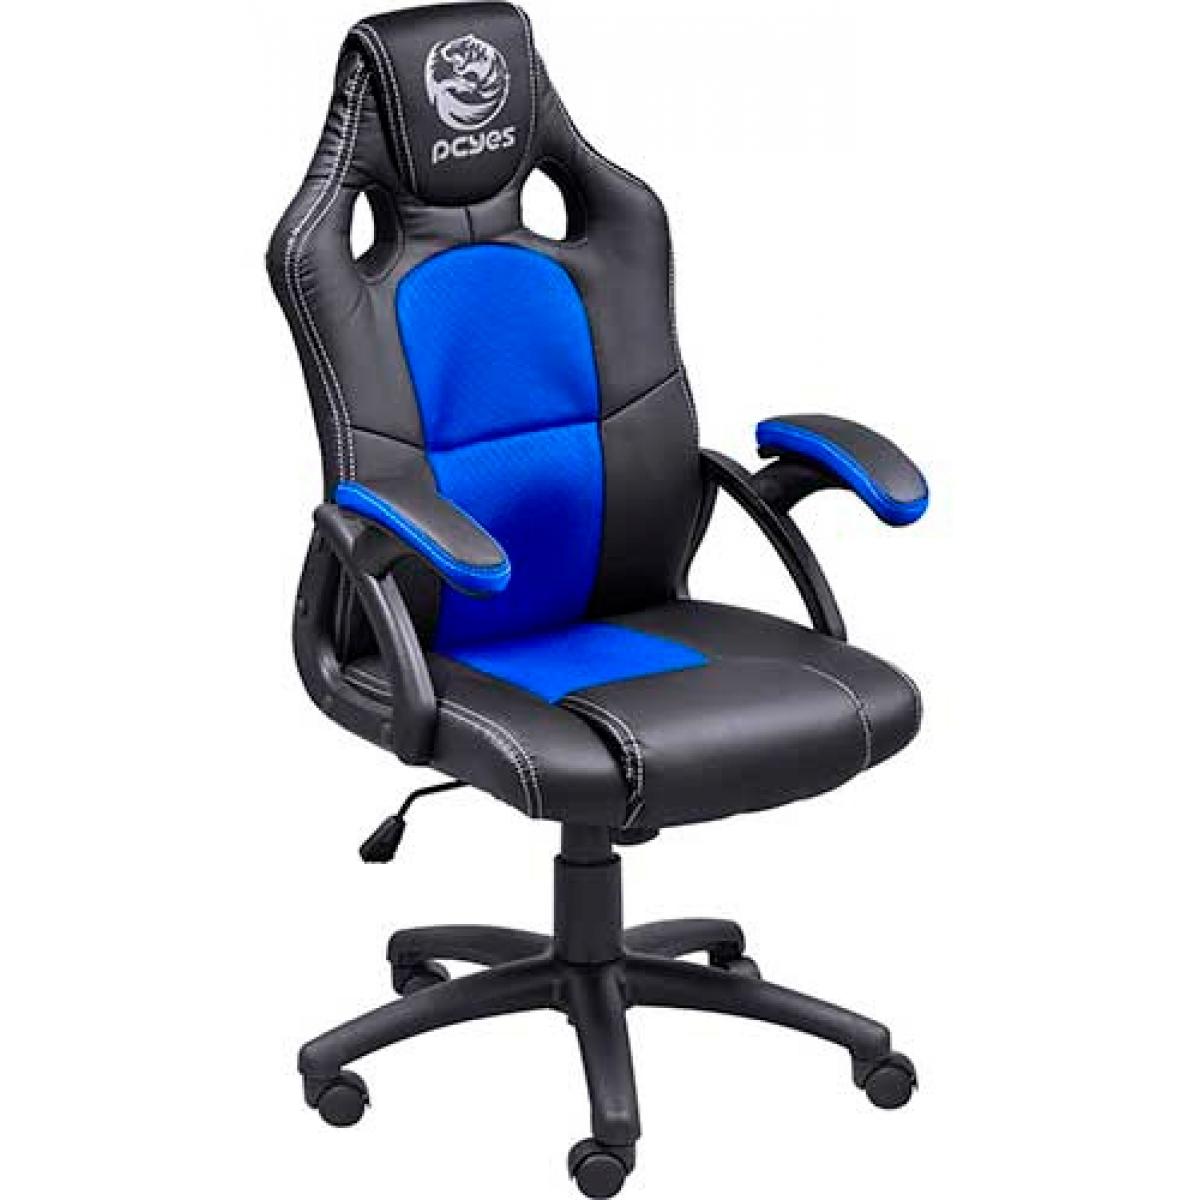 Cadeira Gamer PCYes Mad Racer V6, Black-Blue, MADV6AZ